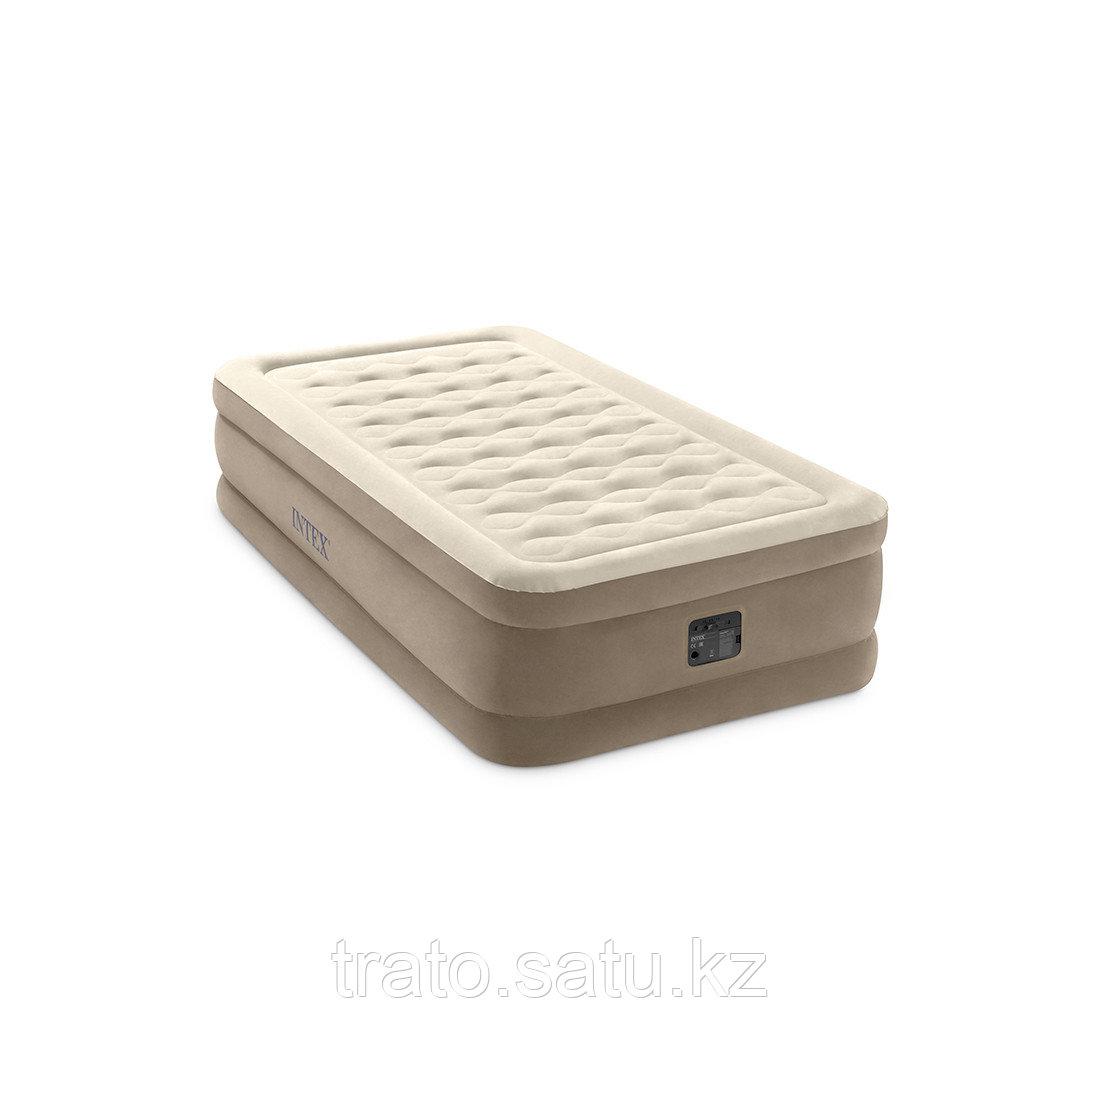 Матрас-кровать надувная Intex 191 х 99 х 46 см